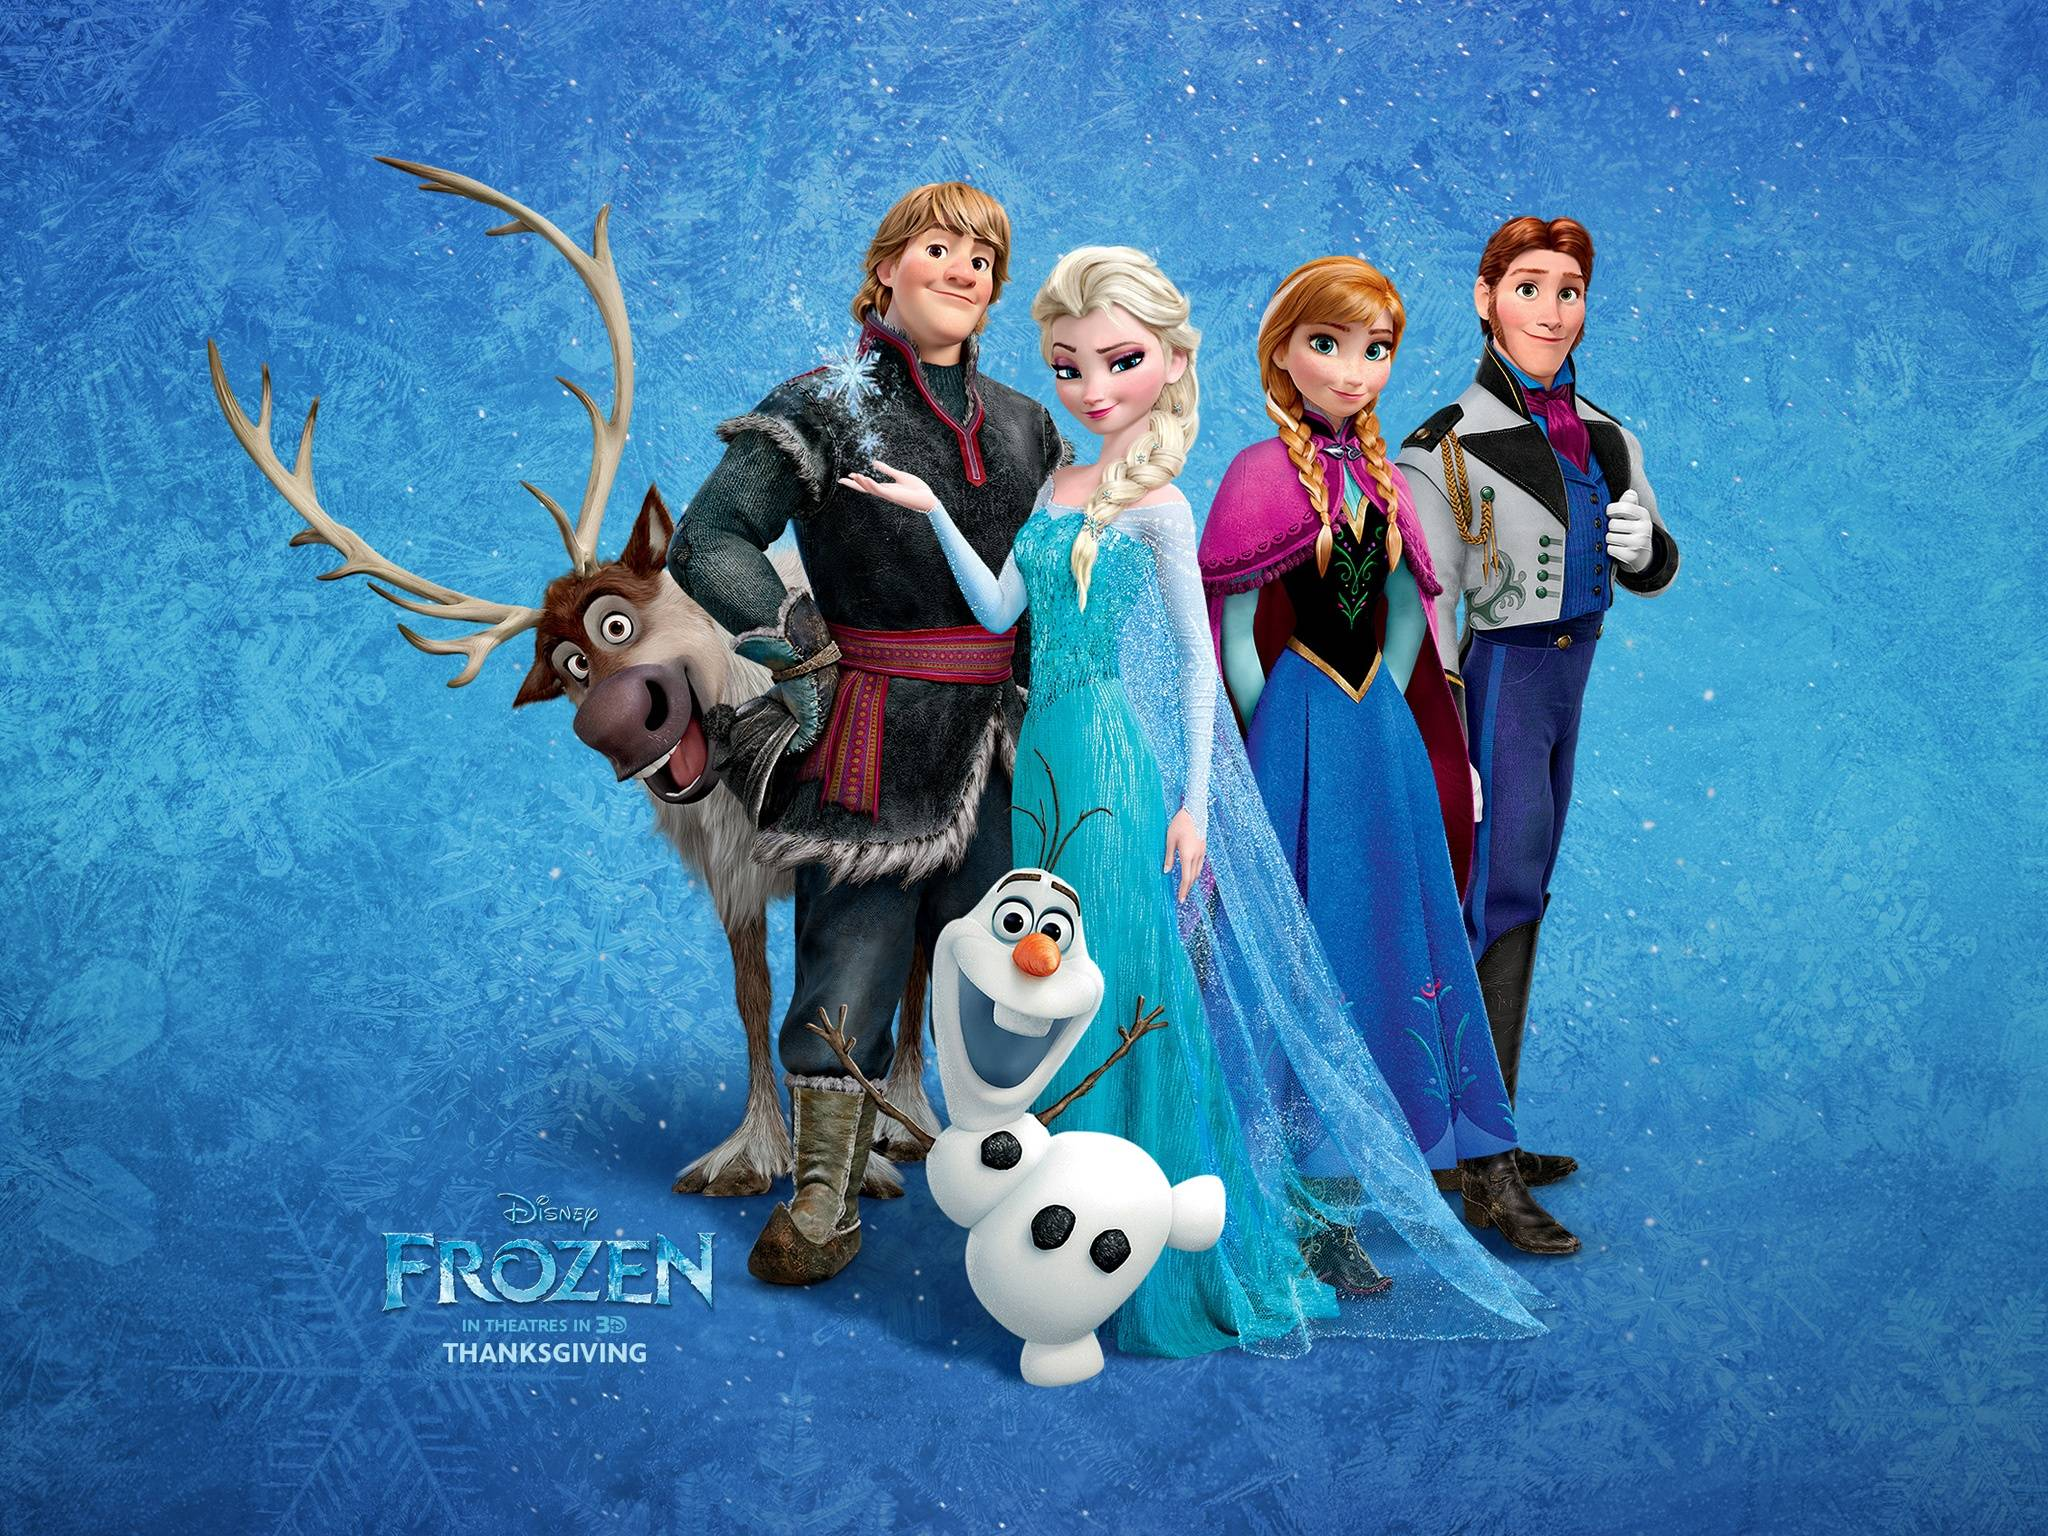 Frozen Wallpaper Wallpaper for Frozen Frozen is a 2013 2048x1536